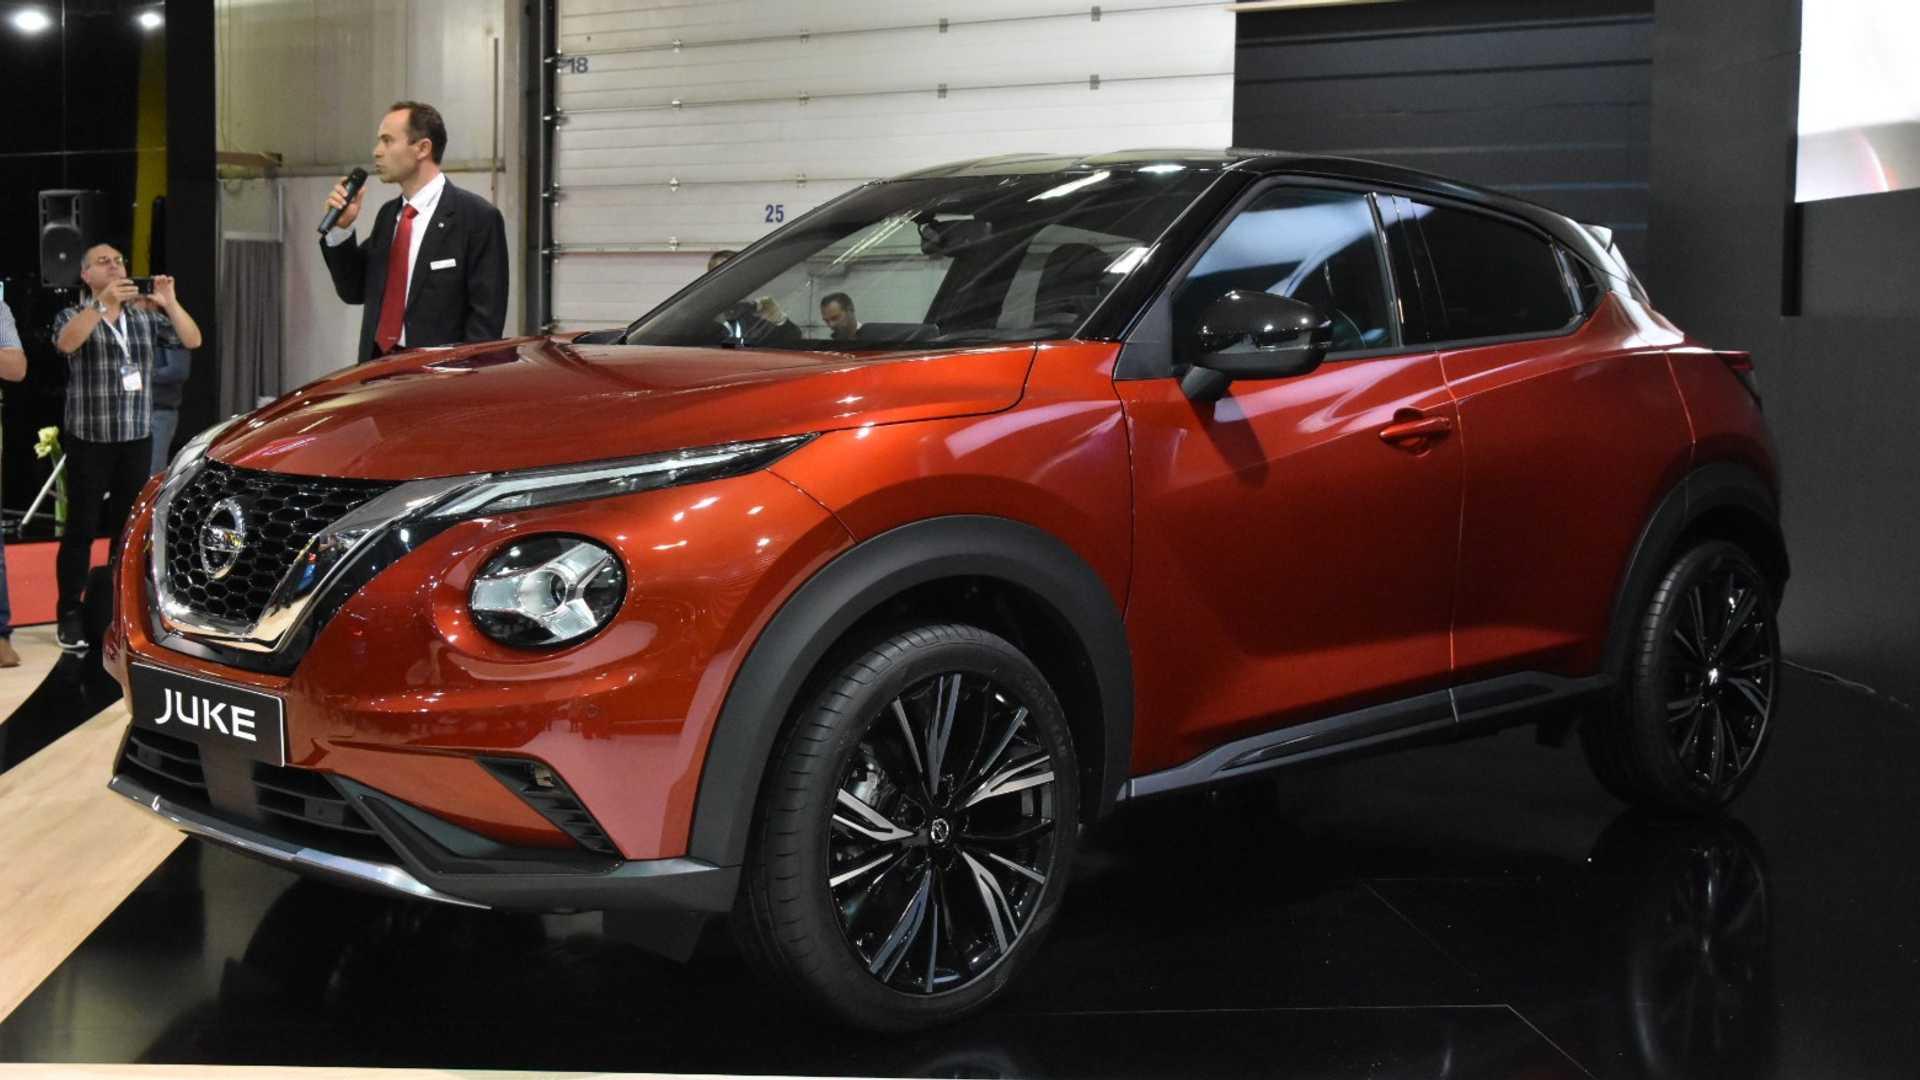 اولین نمایش خودروی Nissan Juke 2020 +تصاویر